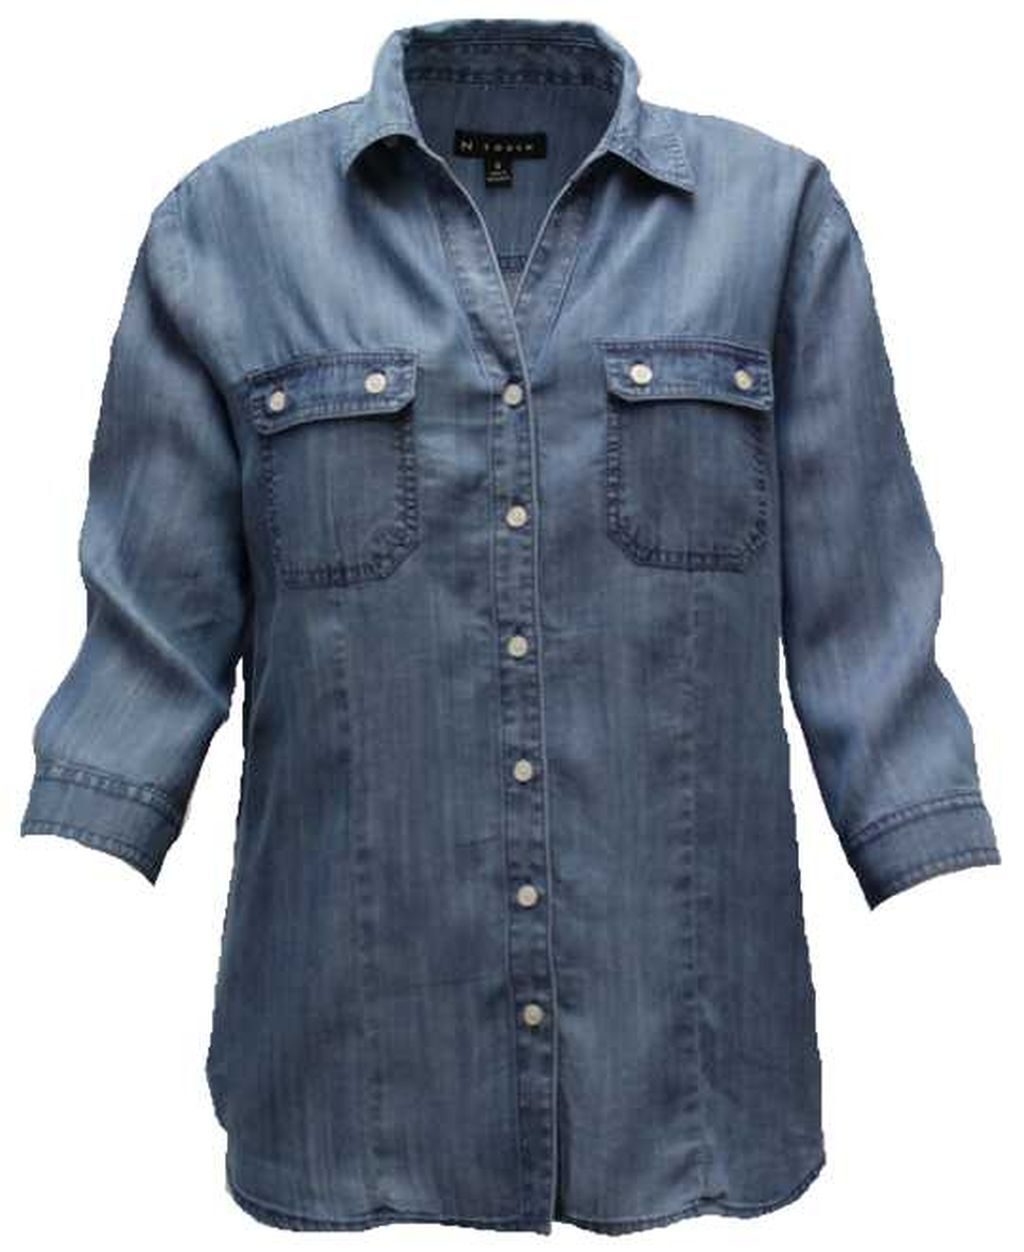 N Touch Tencel Medium Wash Blouse Shirt Tunic   Größe  3X    3199